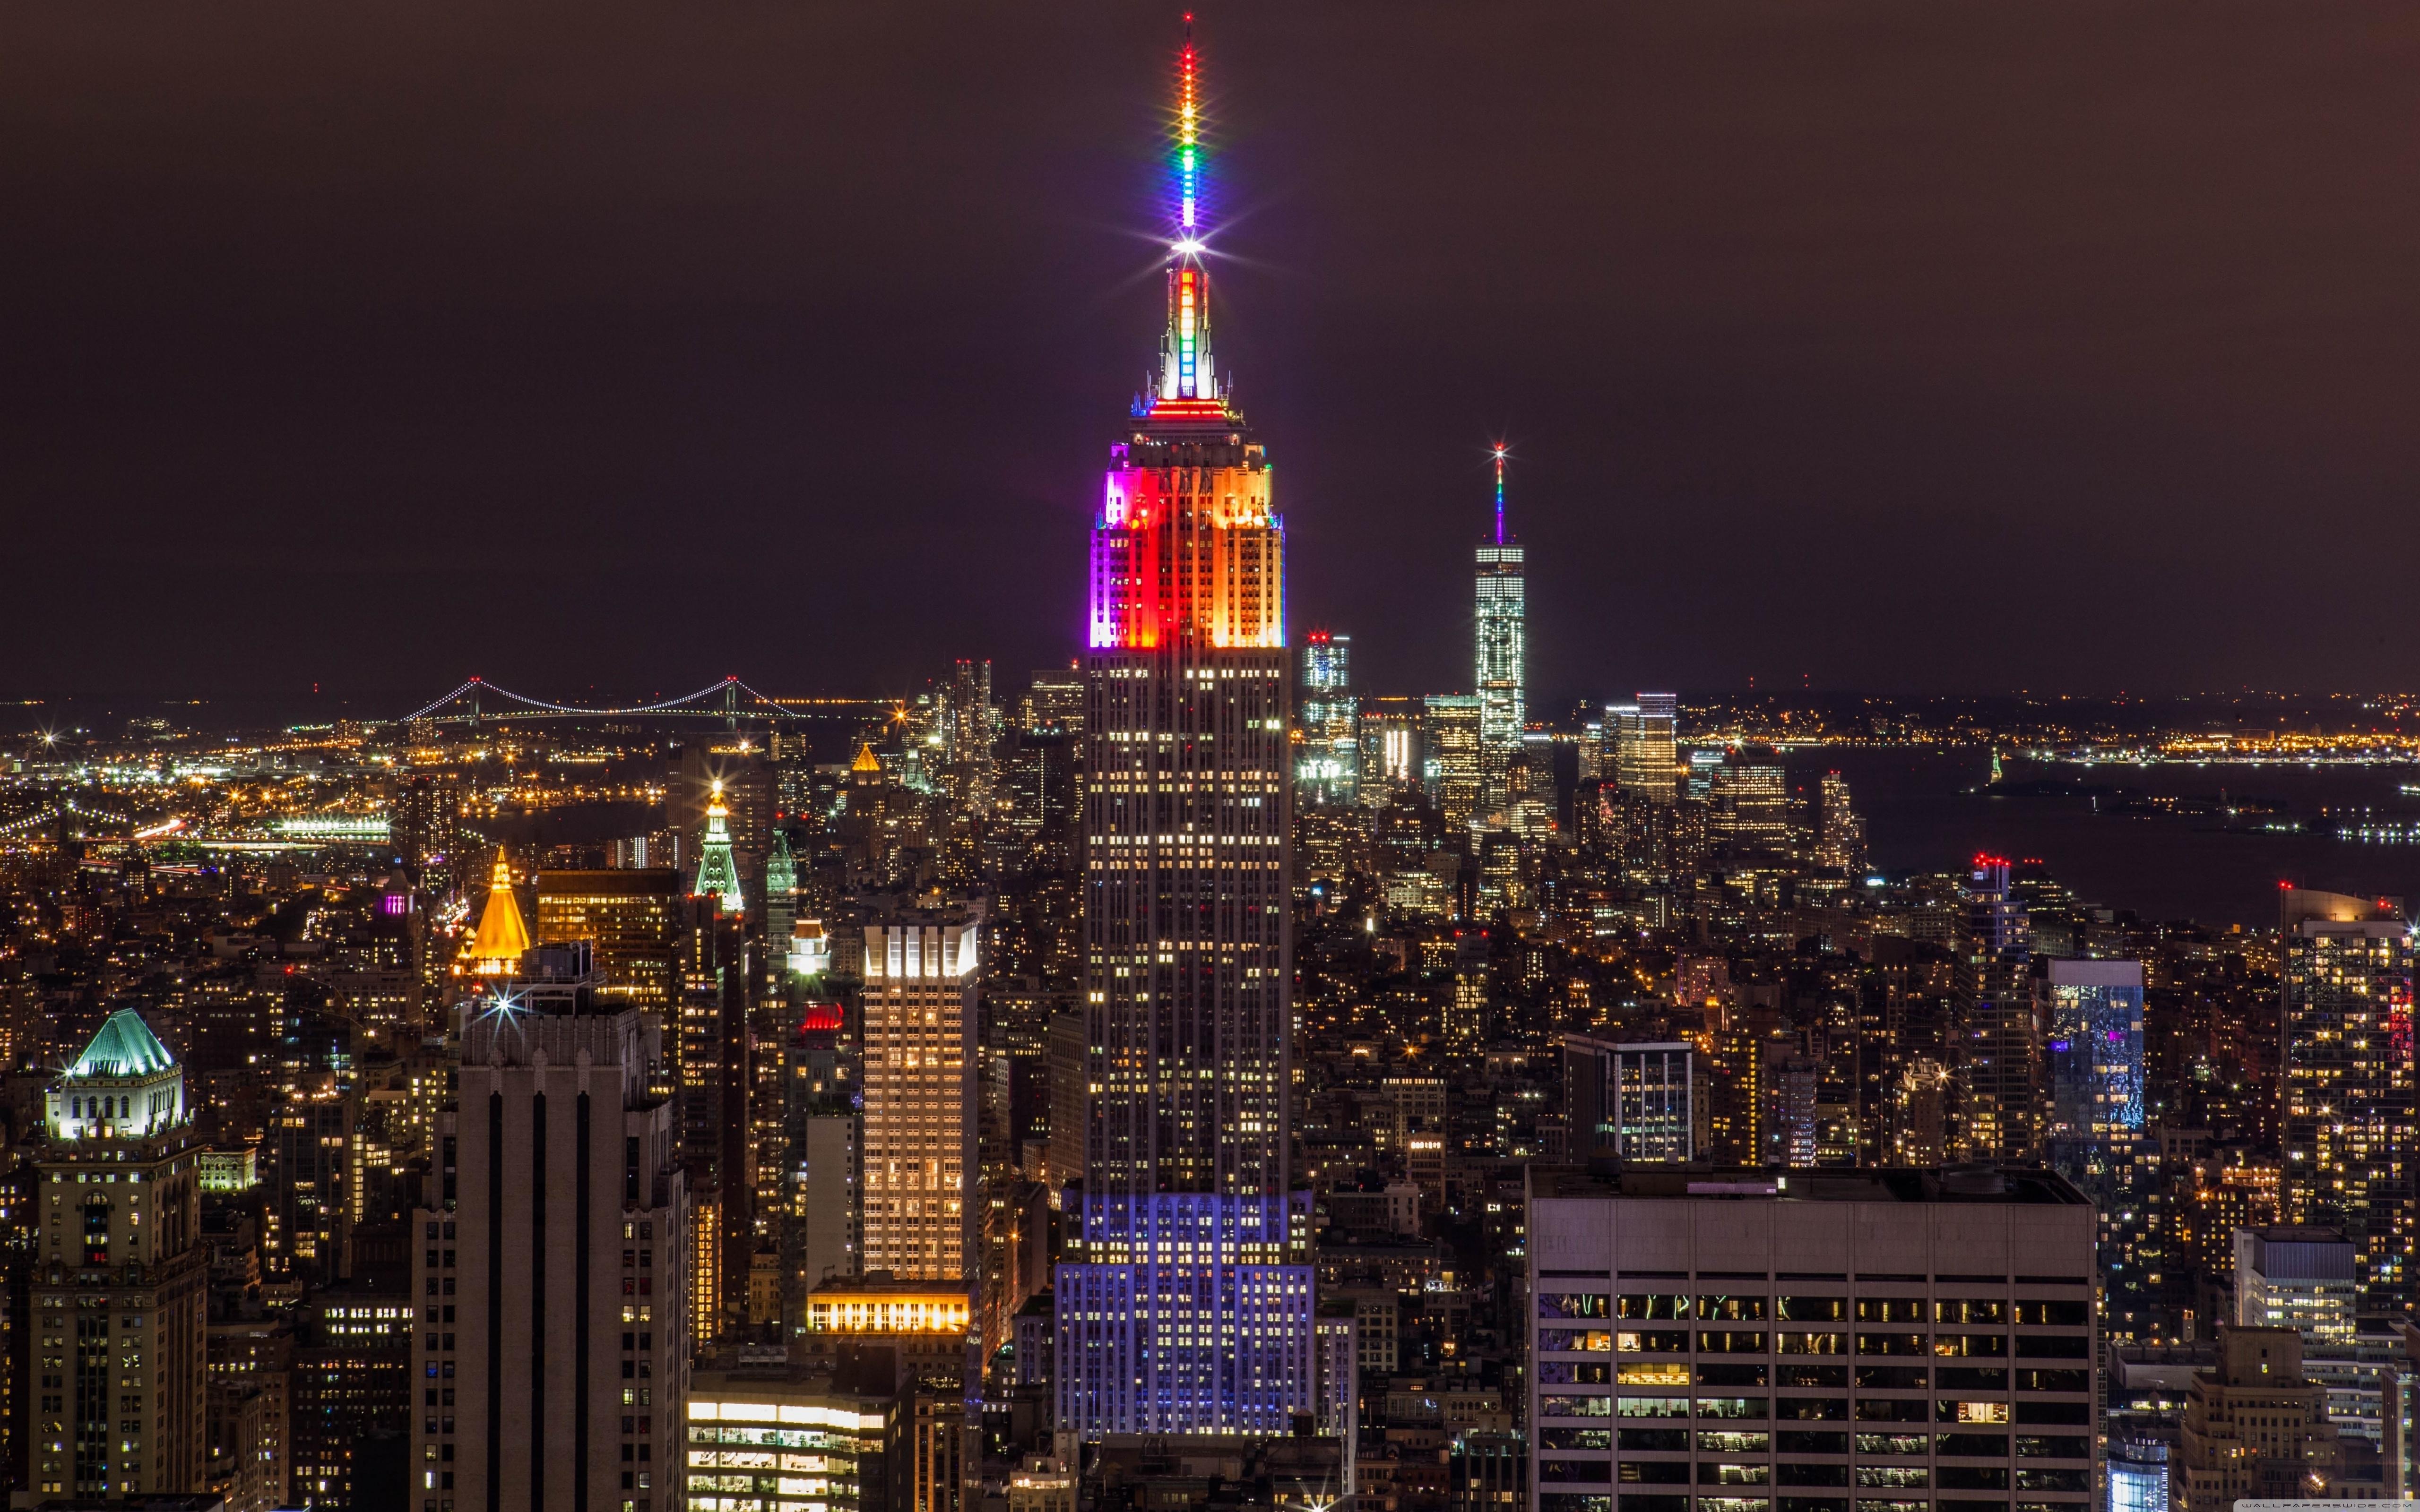 new york city night lights ❤ 4k hd desktop wallpaper for 4k ultra